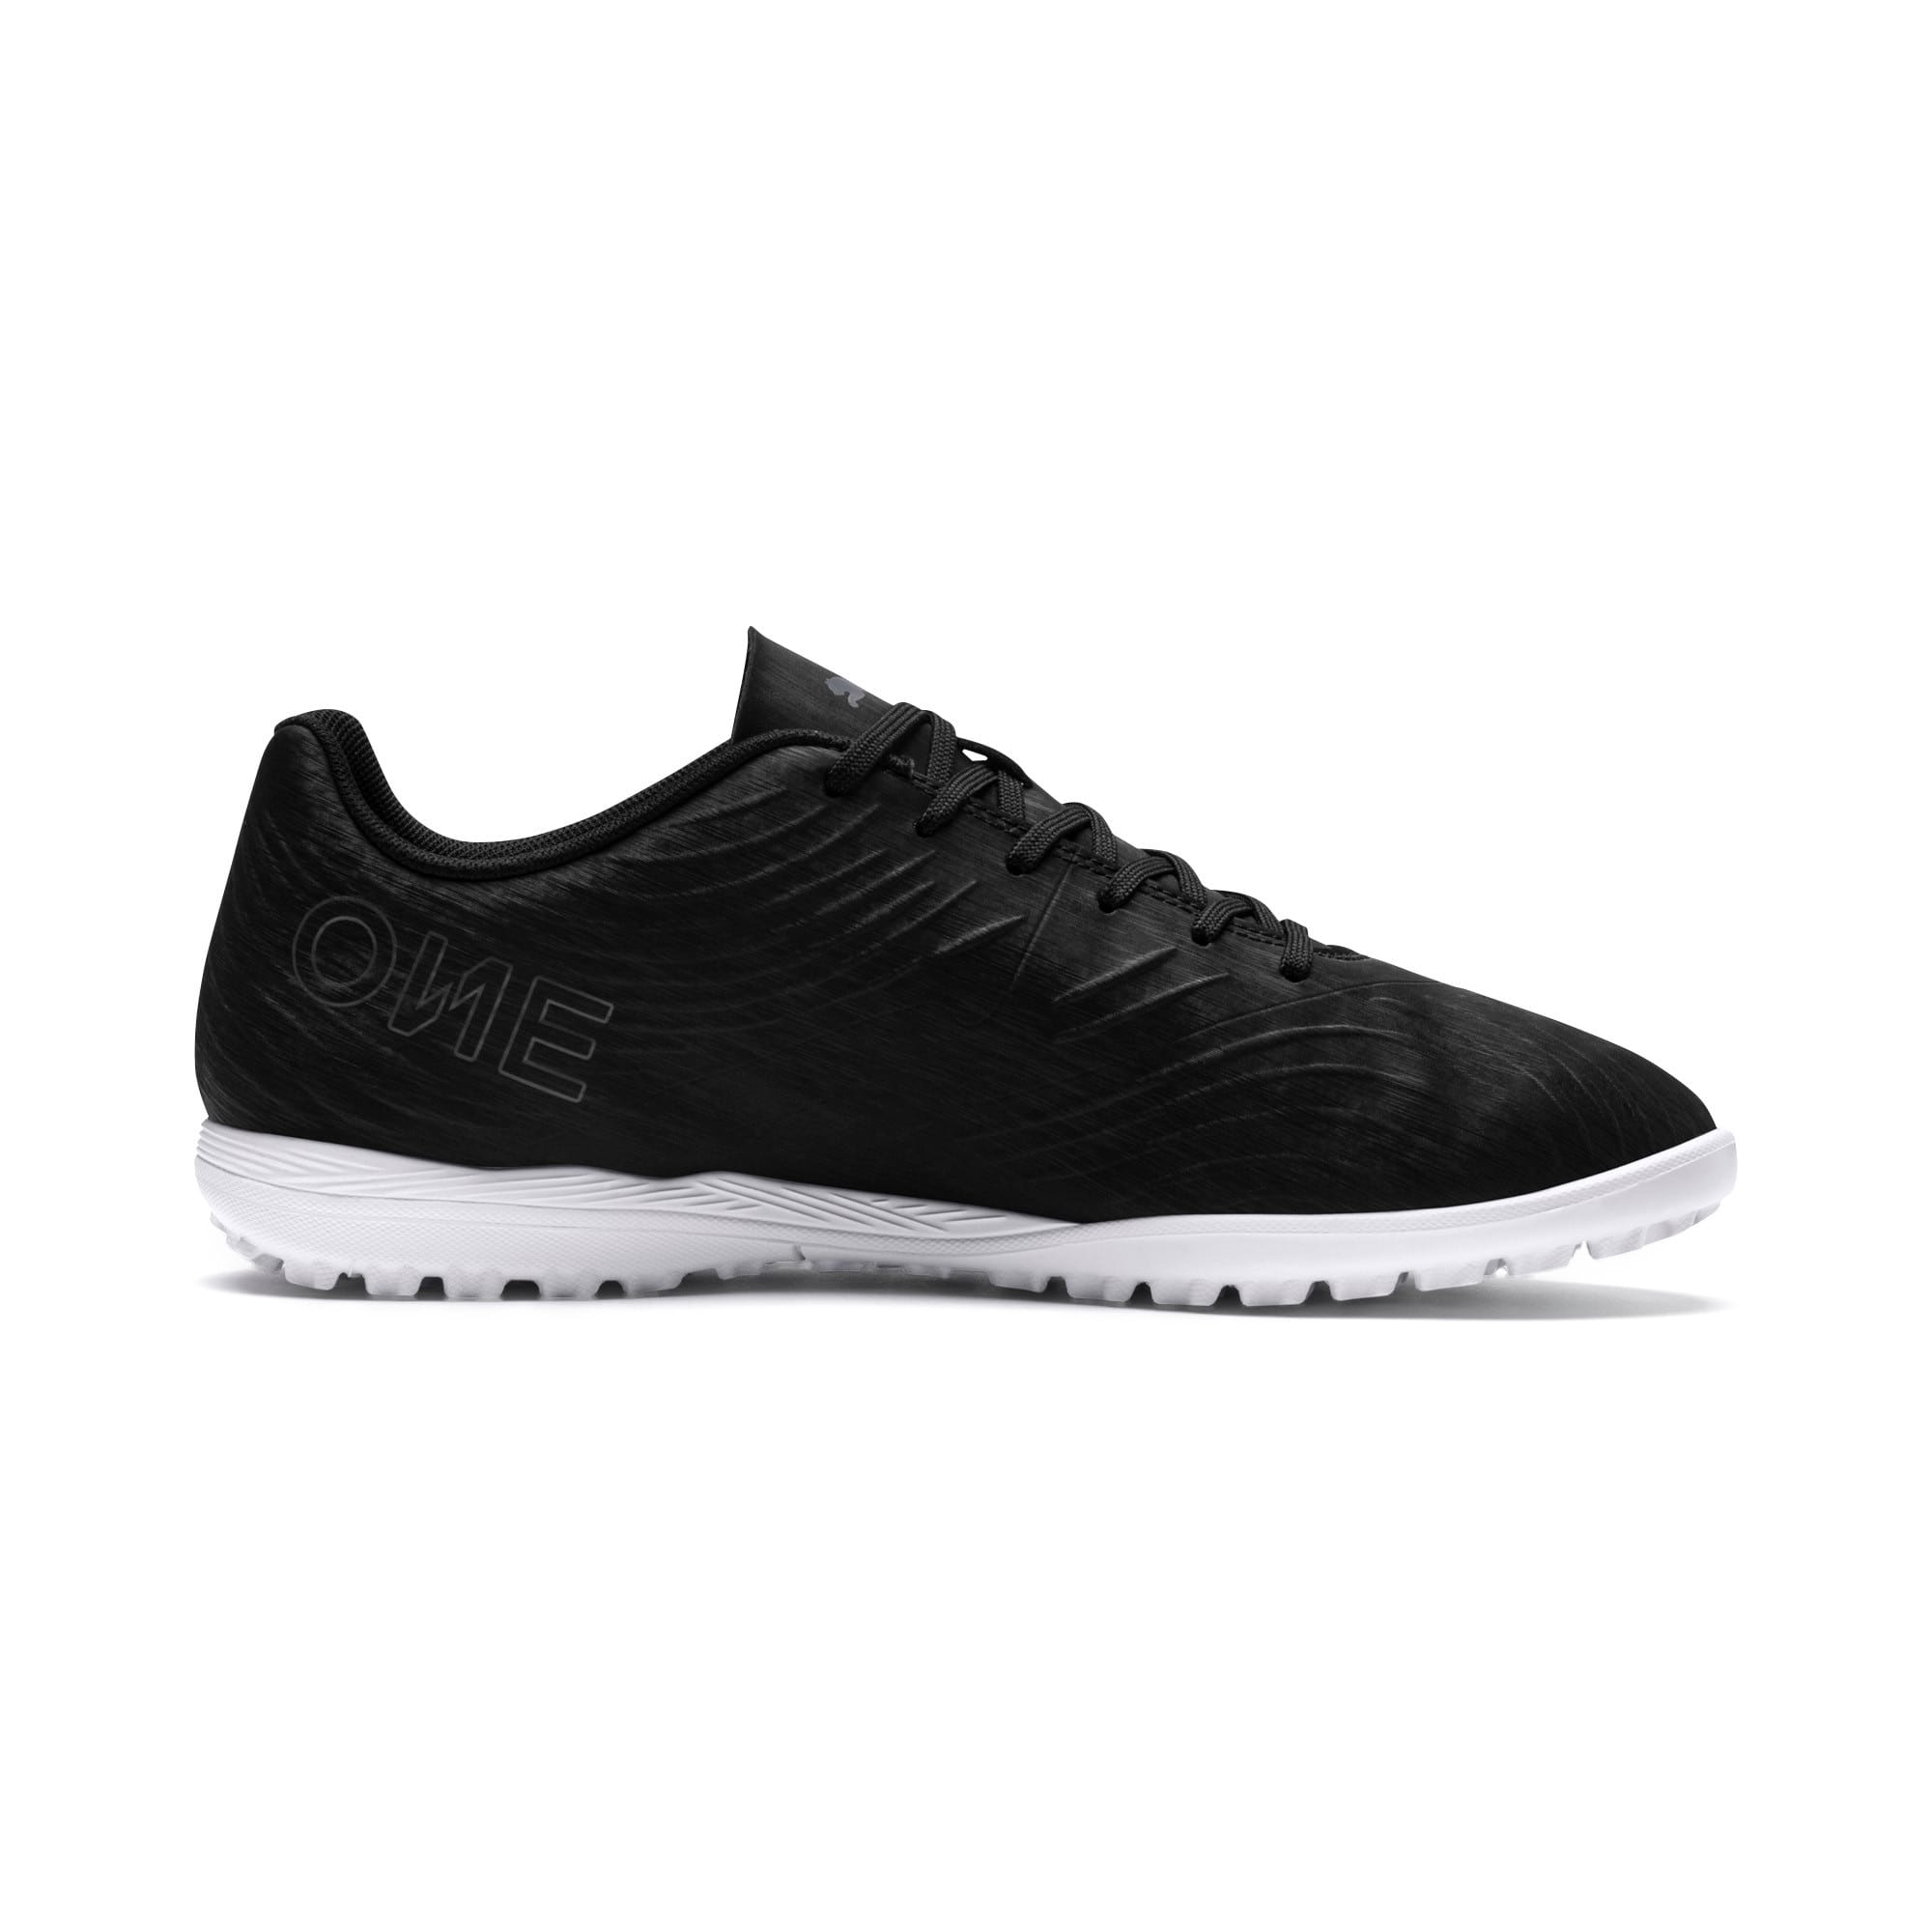 Thumbnail 5 of PUMA ONE 19.4 TT Men's Soccer Shoes, Puma Black-Puma Black-White, medium